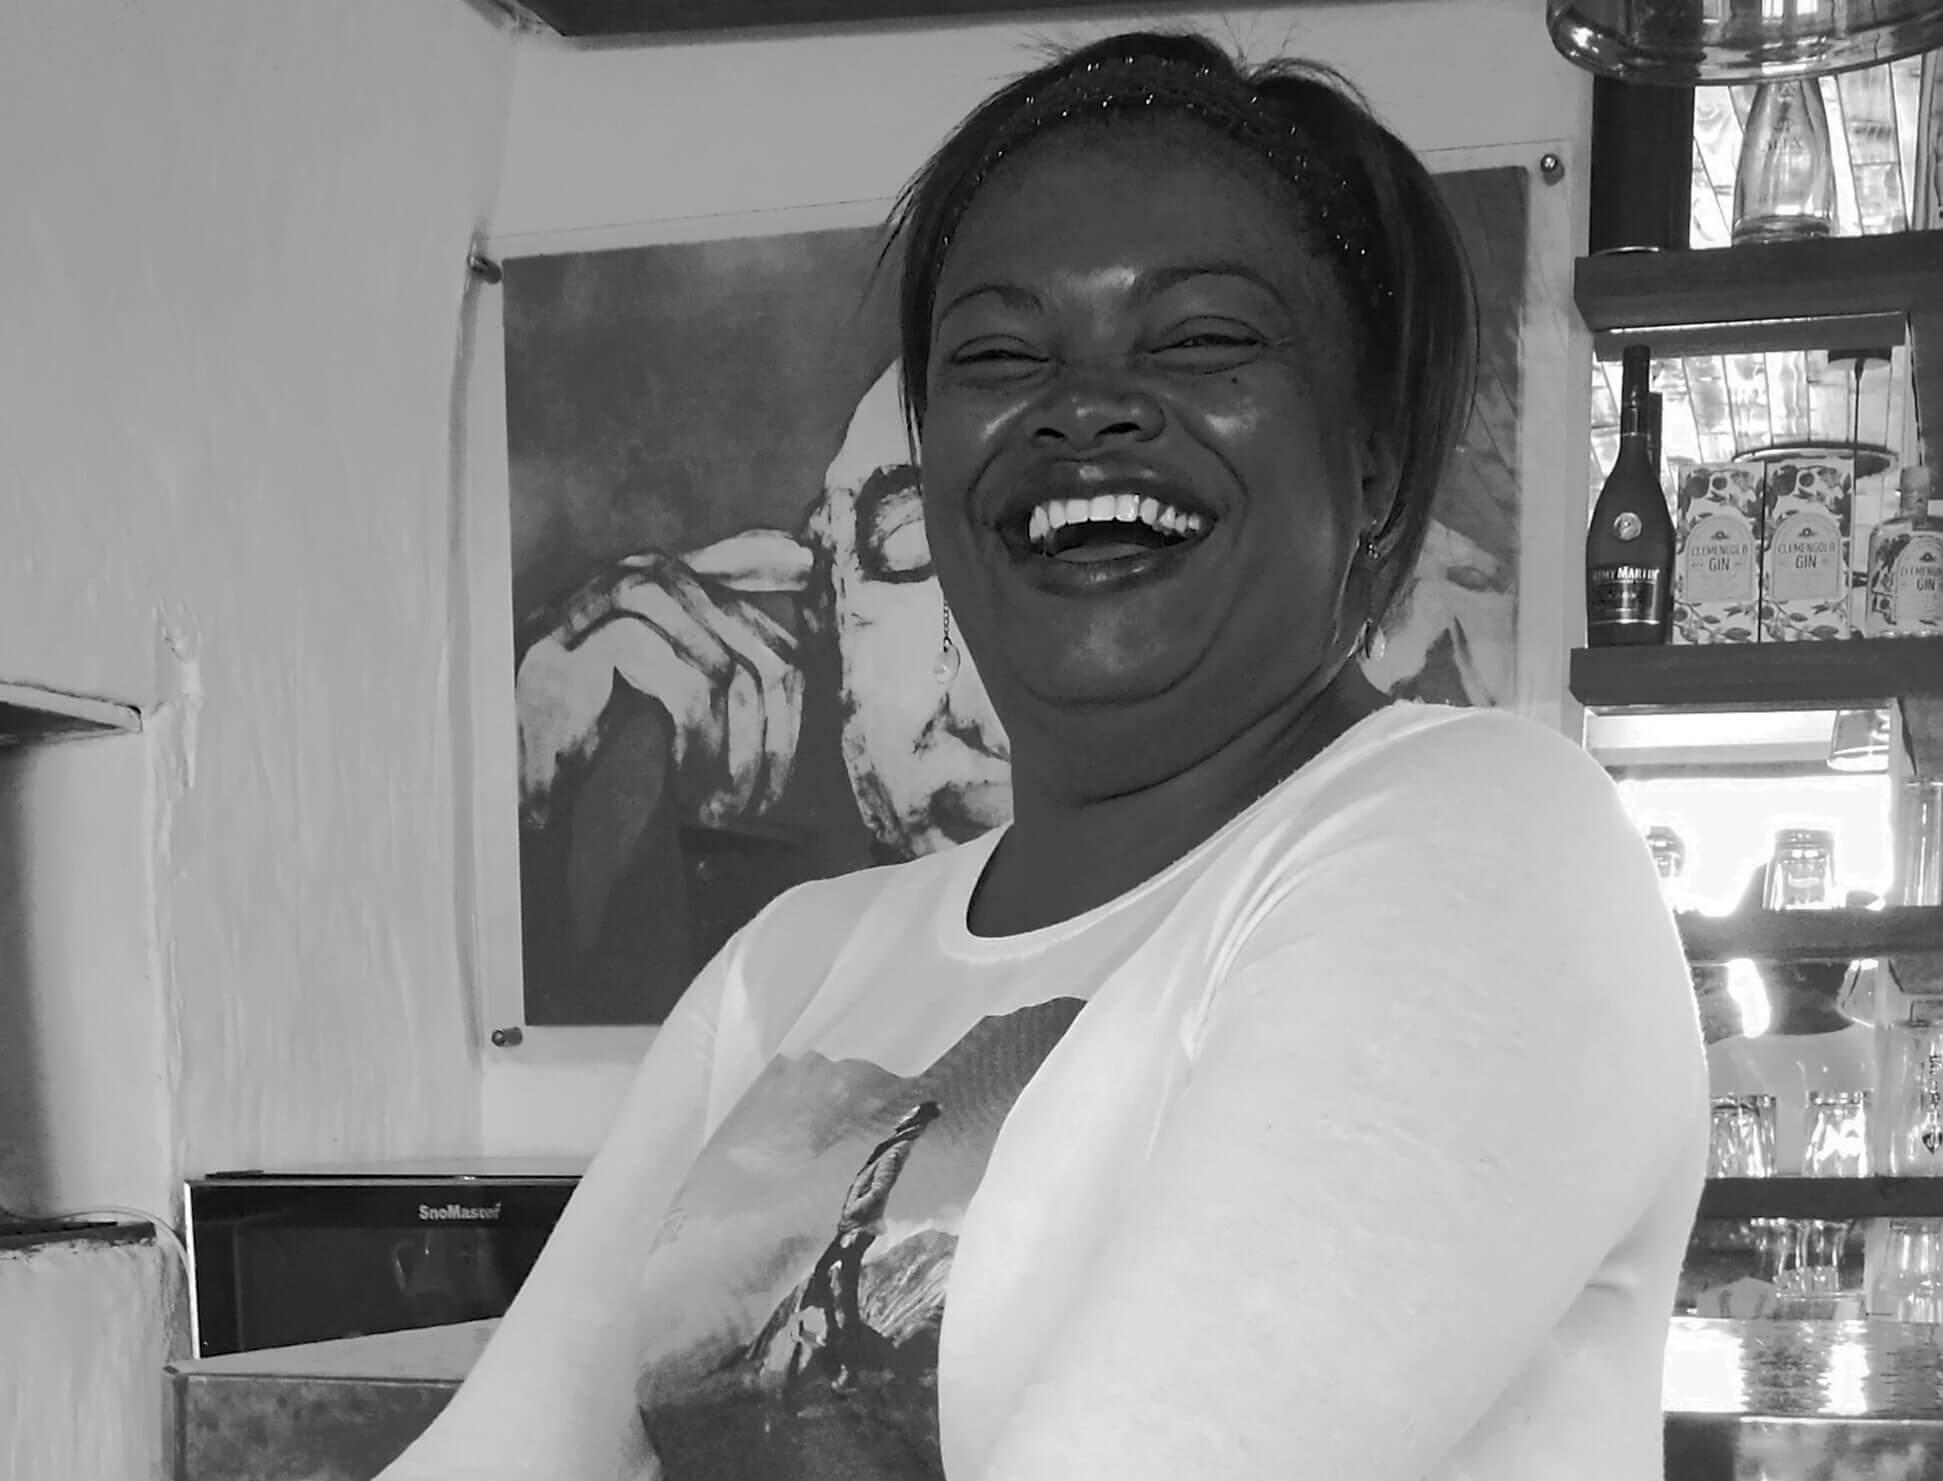 Damhuis Restaurant Manager Zelda Williams